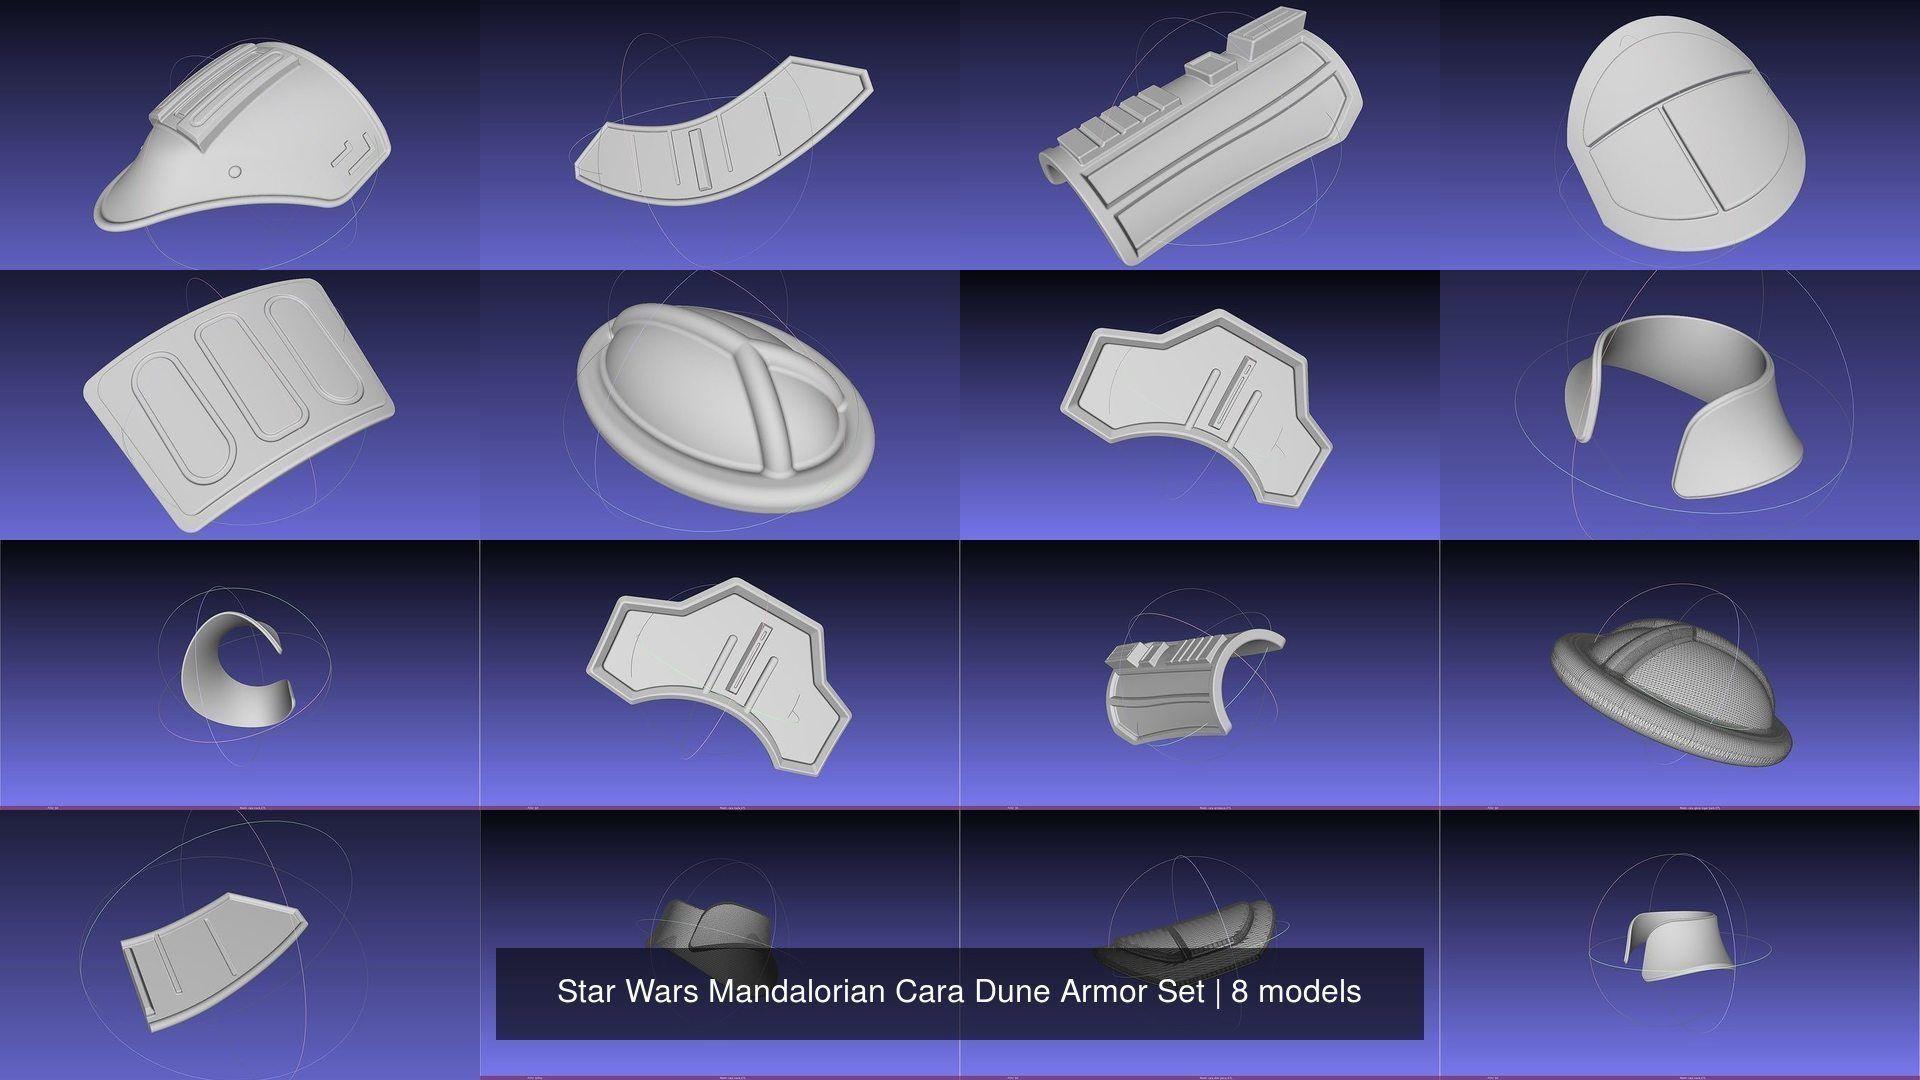 Star Wars Mandalorian Cara Dune Armor Set